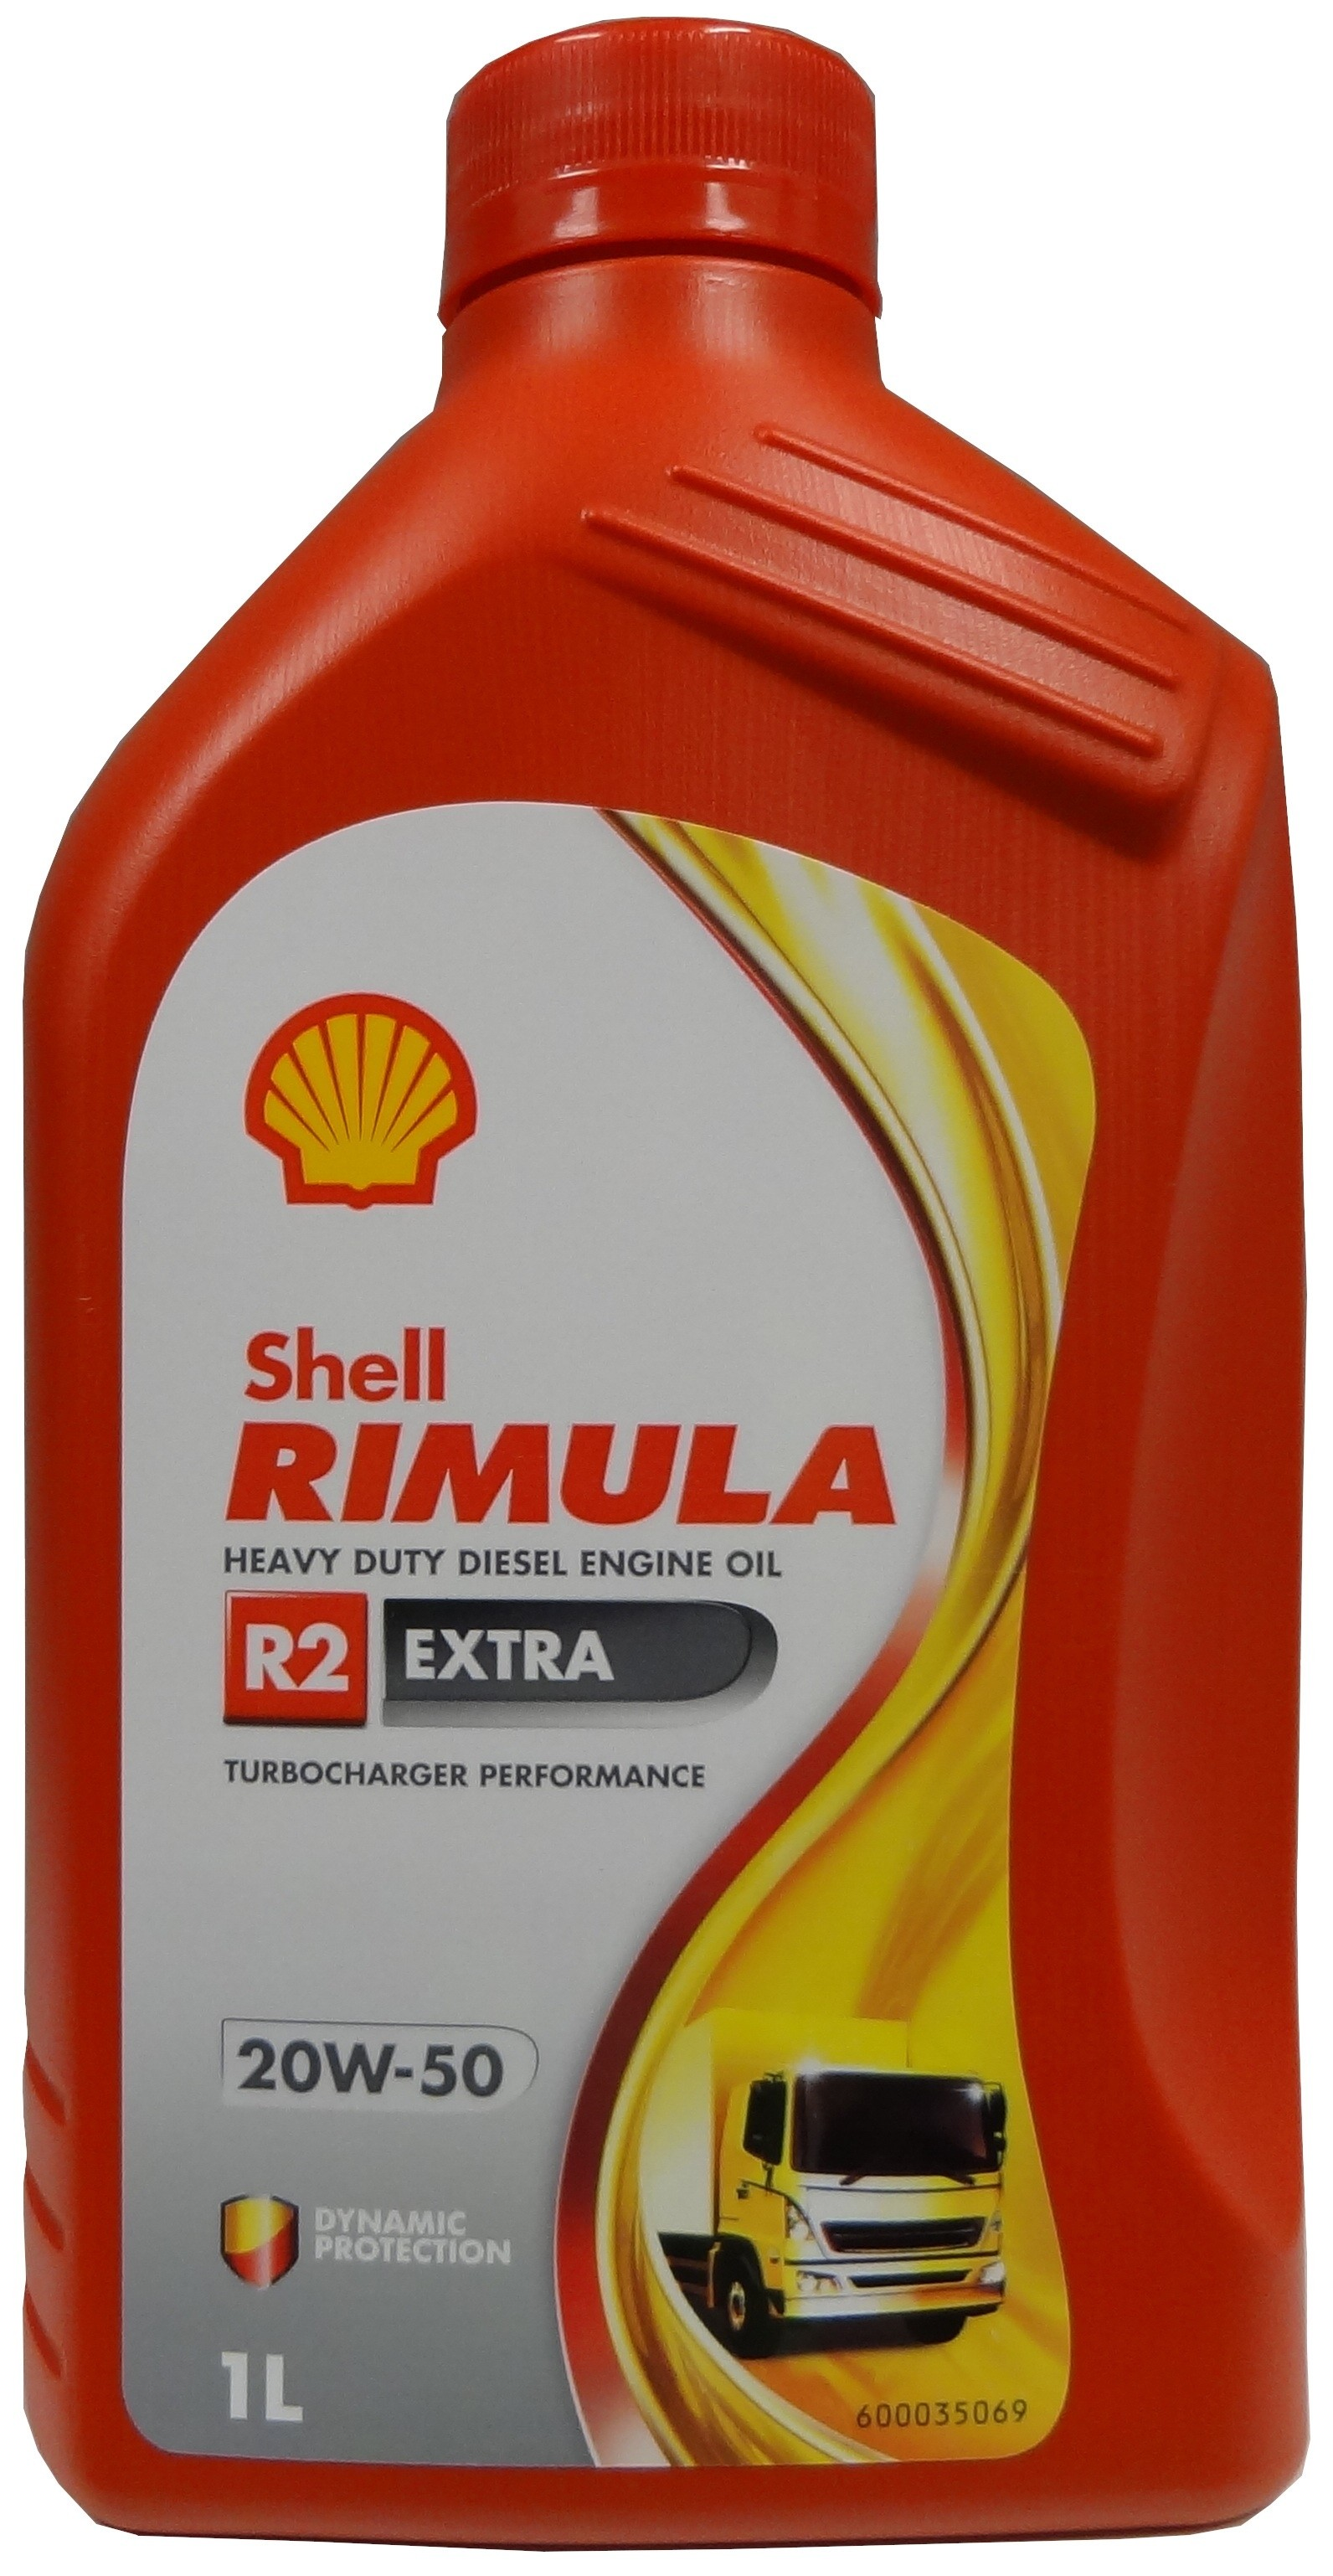 Shell Rimula R2 Extra 20W-50 1L